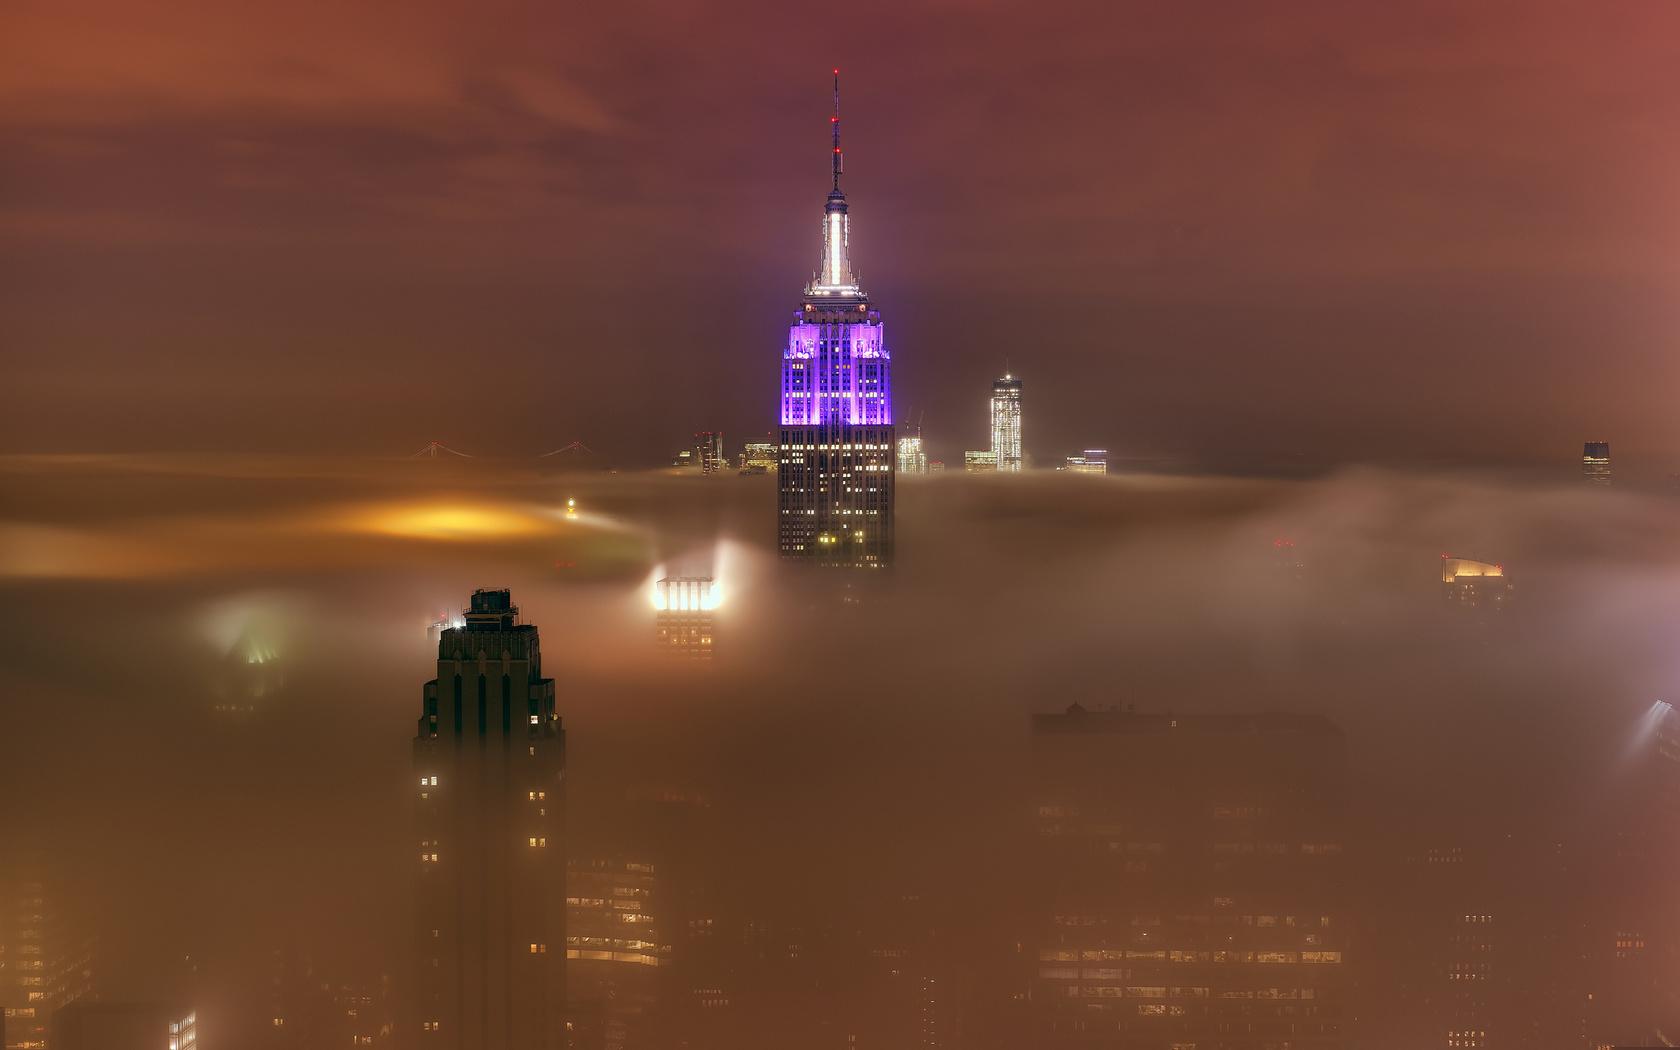 туман, город, туман, облако, нью йорк, 15 мая 2012 год, New york